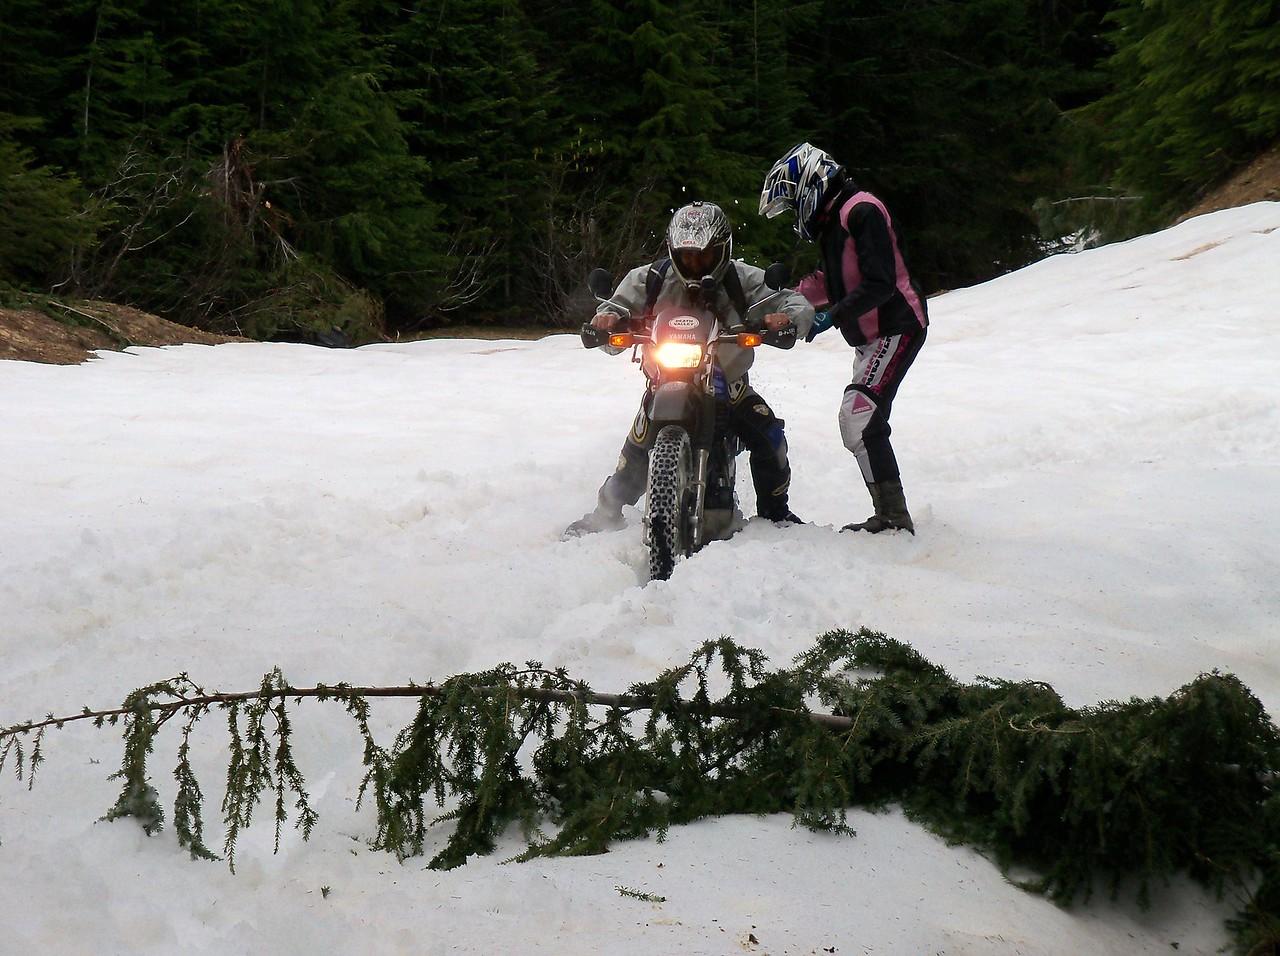 Sylvia let Scott ride her bike thru the snow drift, bad idea..!